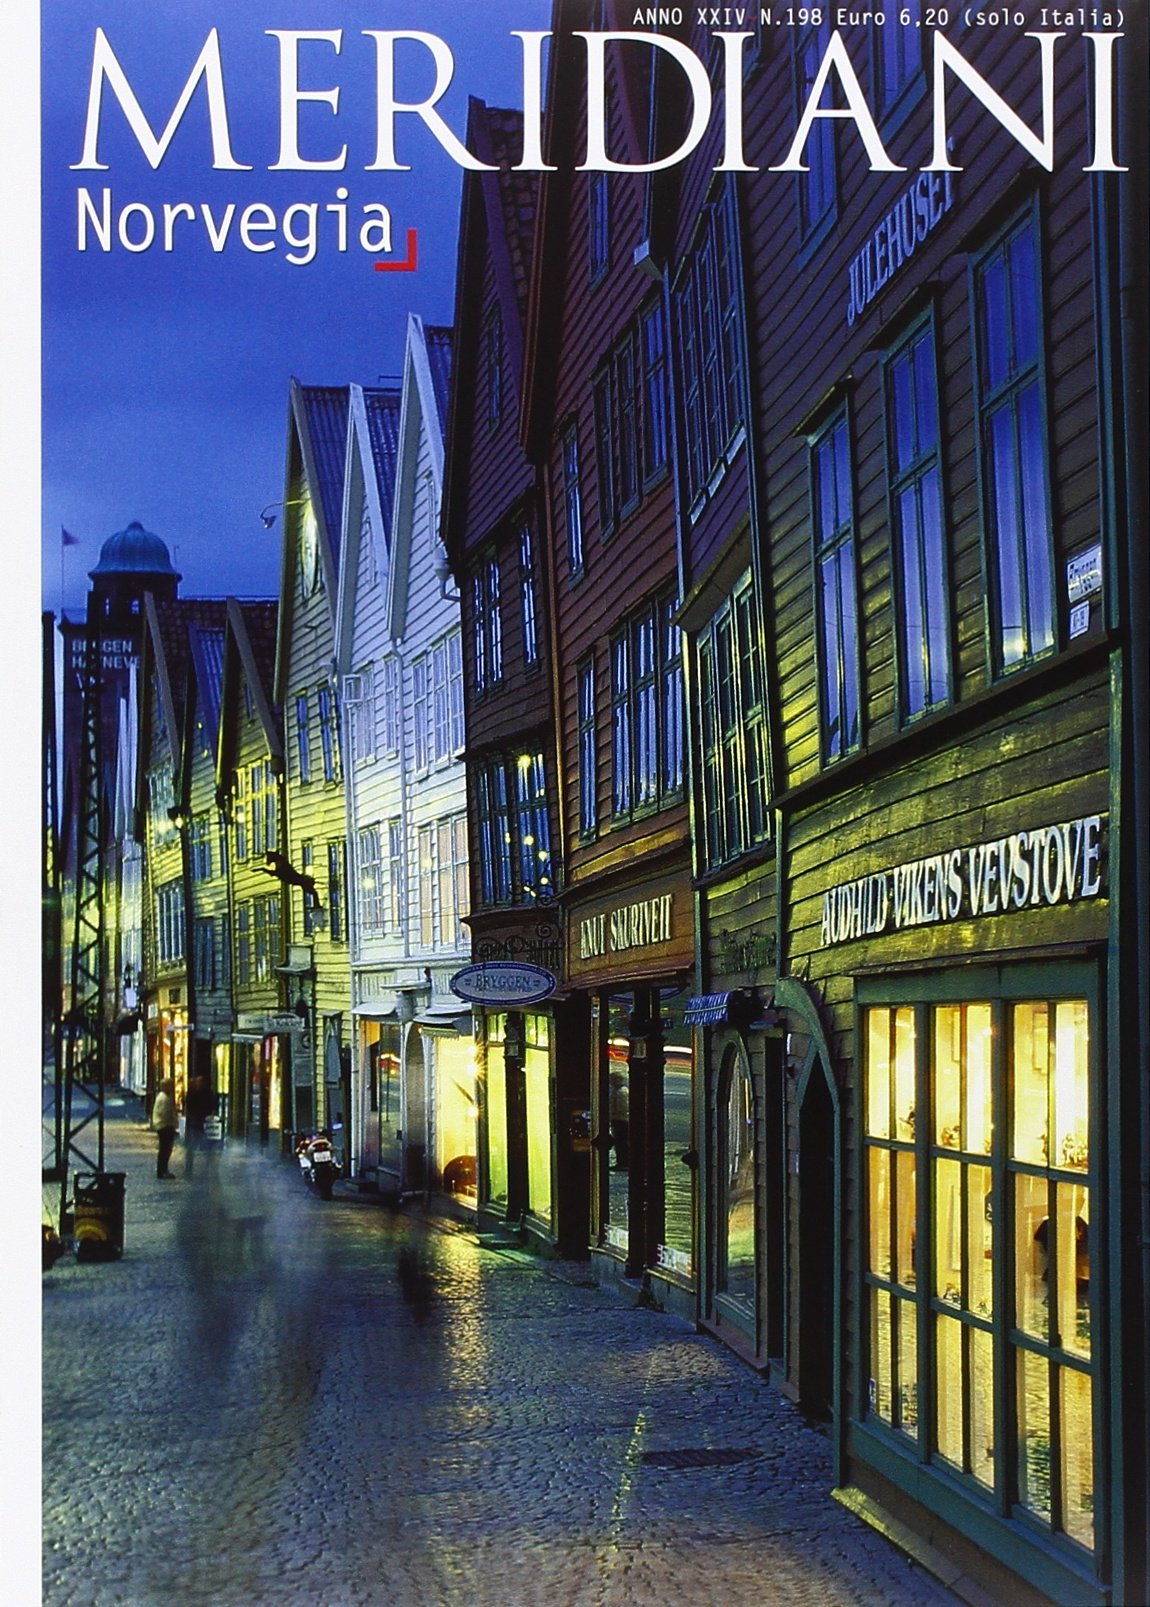 MERIDIANI 198 - NORVEGIA Copertina flessibile – 26 mag 2011 AAVV. EDITORIALE DOMUS 8872127033 GEOGRAFIA GENERALE. VIAGGI